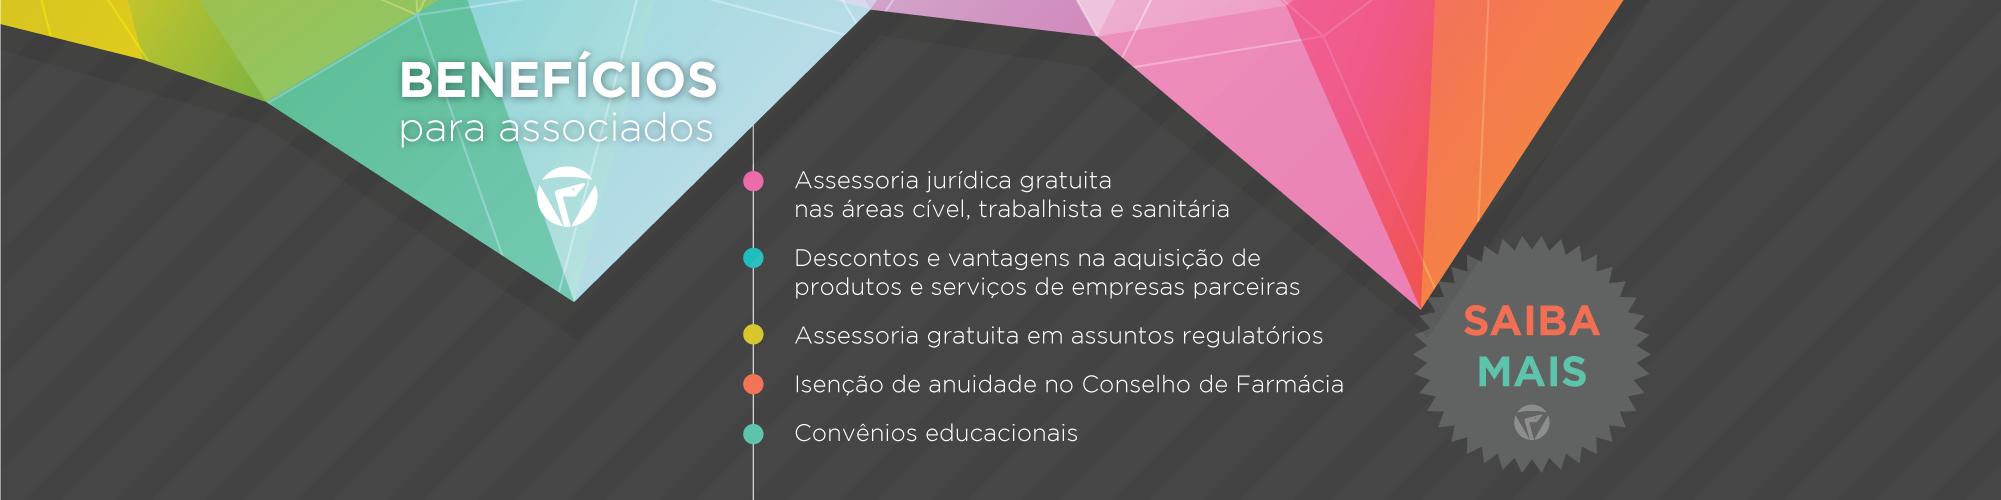 2016-01-26-2946-Ascoferj-Banners-Institucionais-beneficios